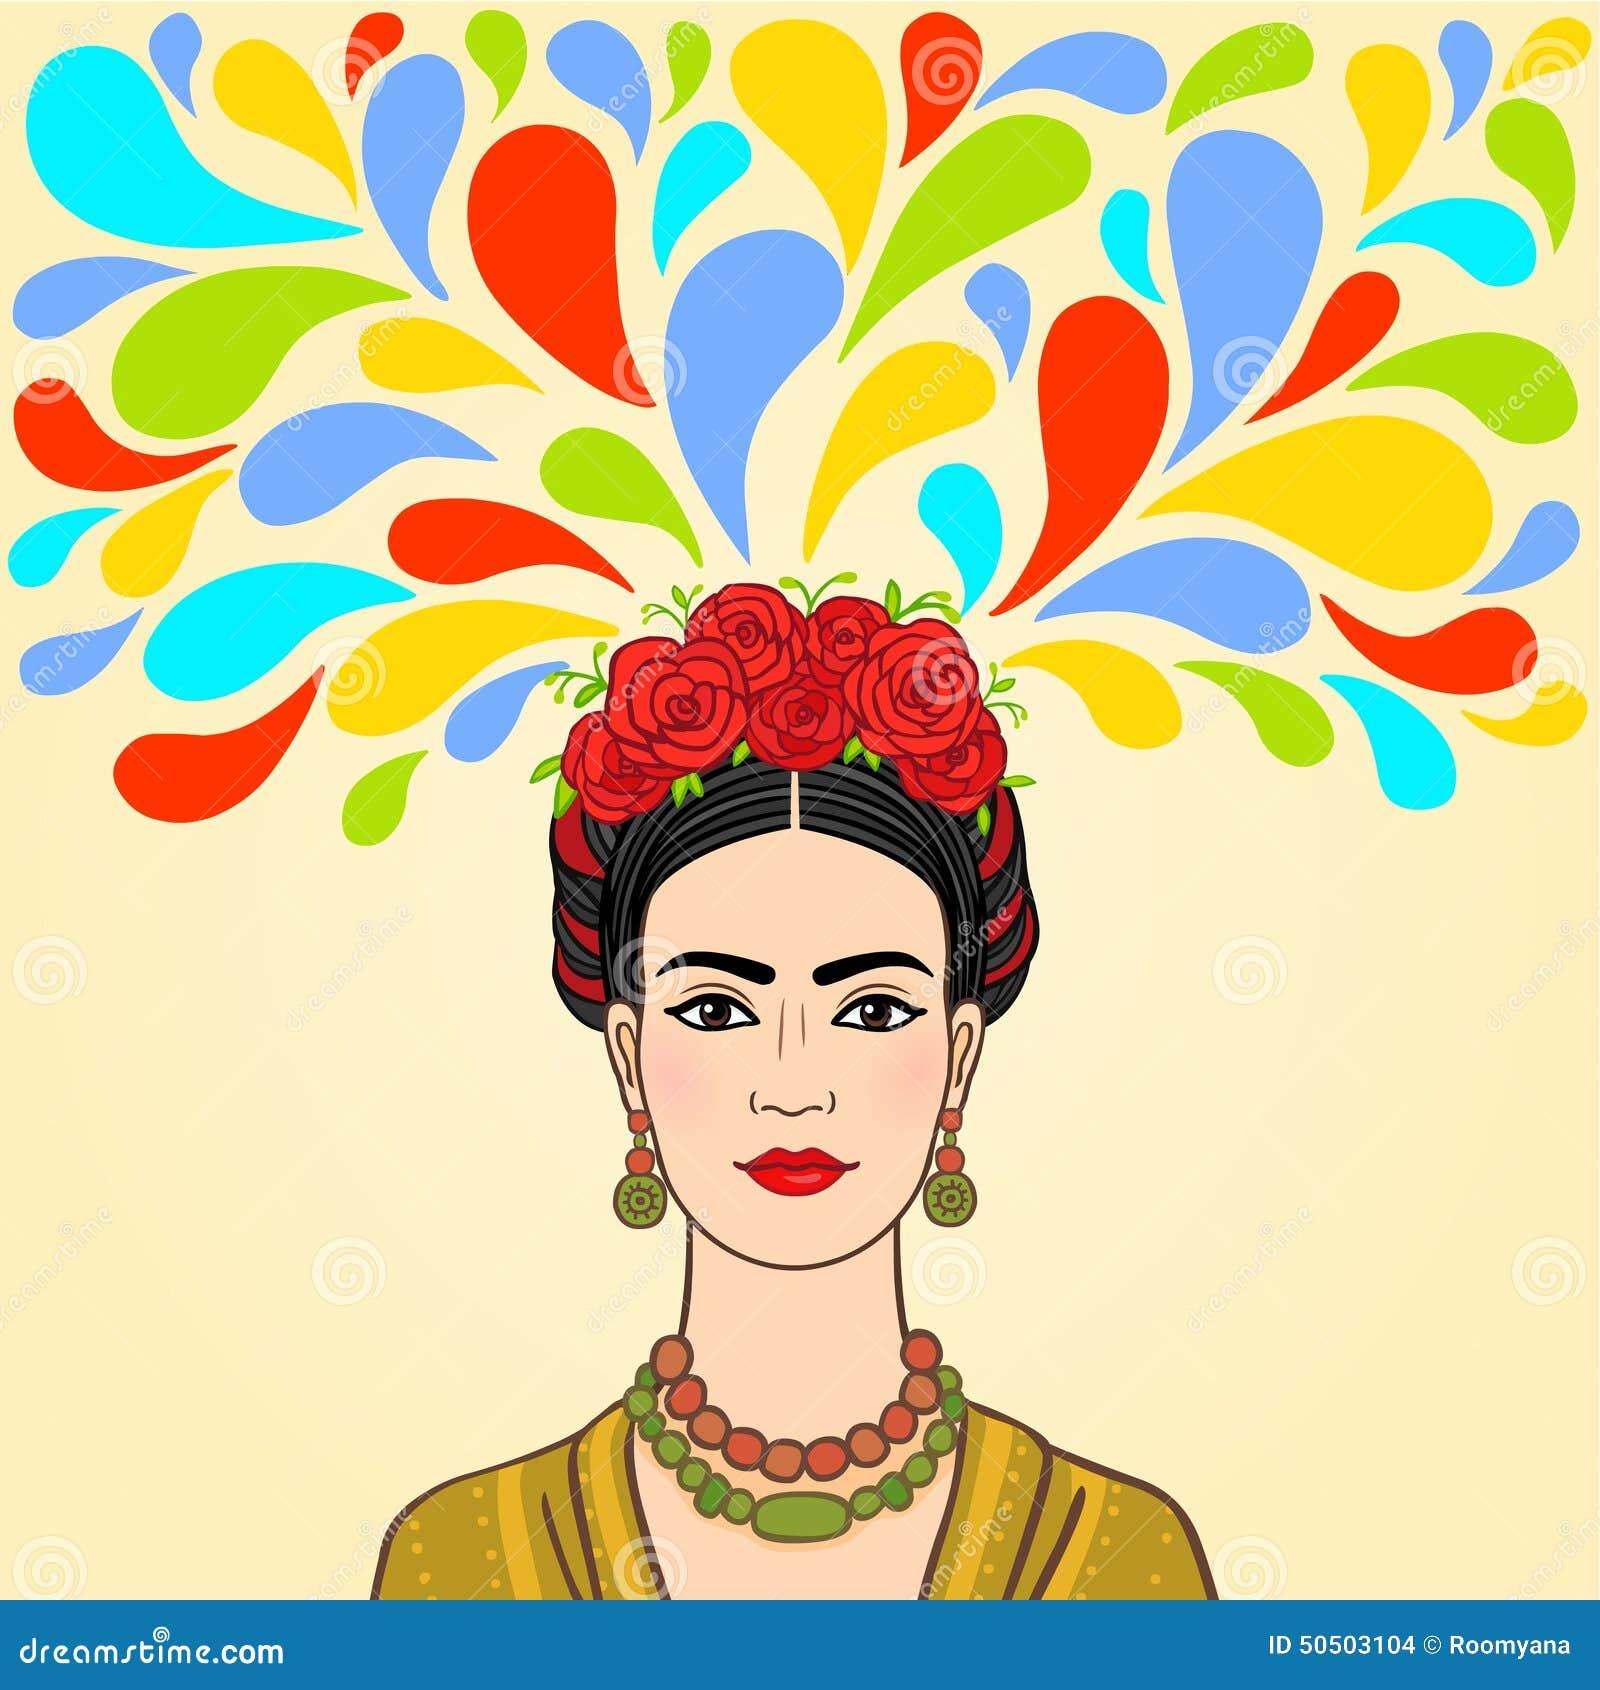 Femme mexicaine : imagination